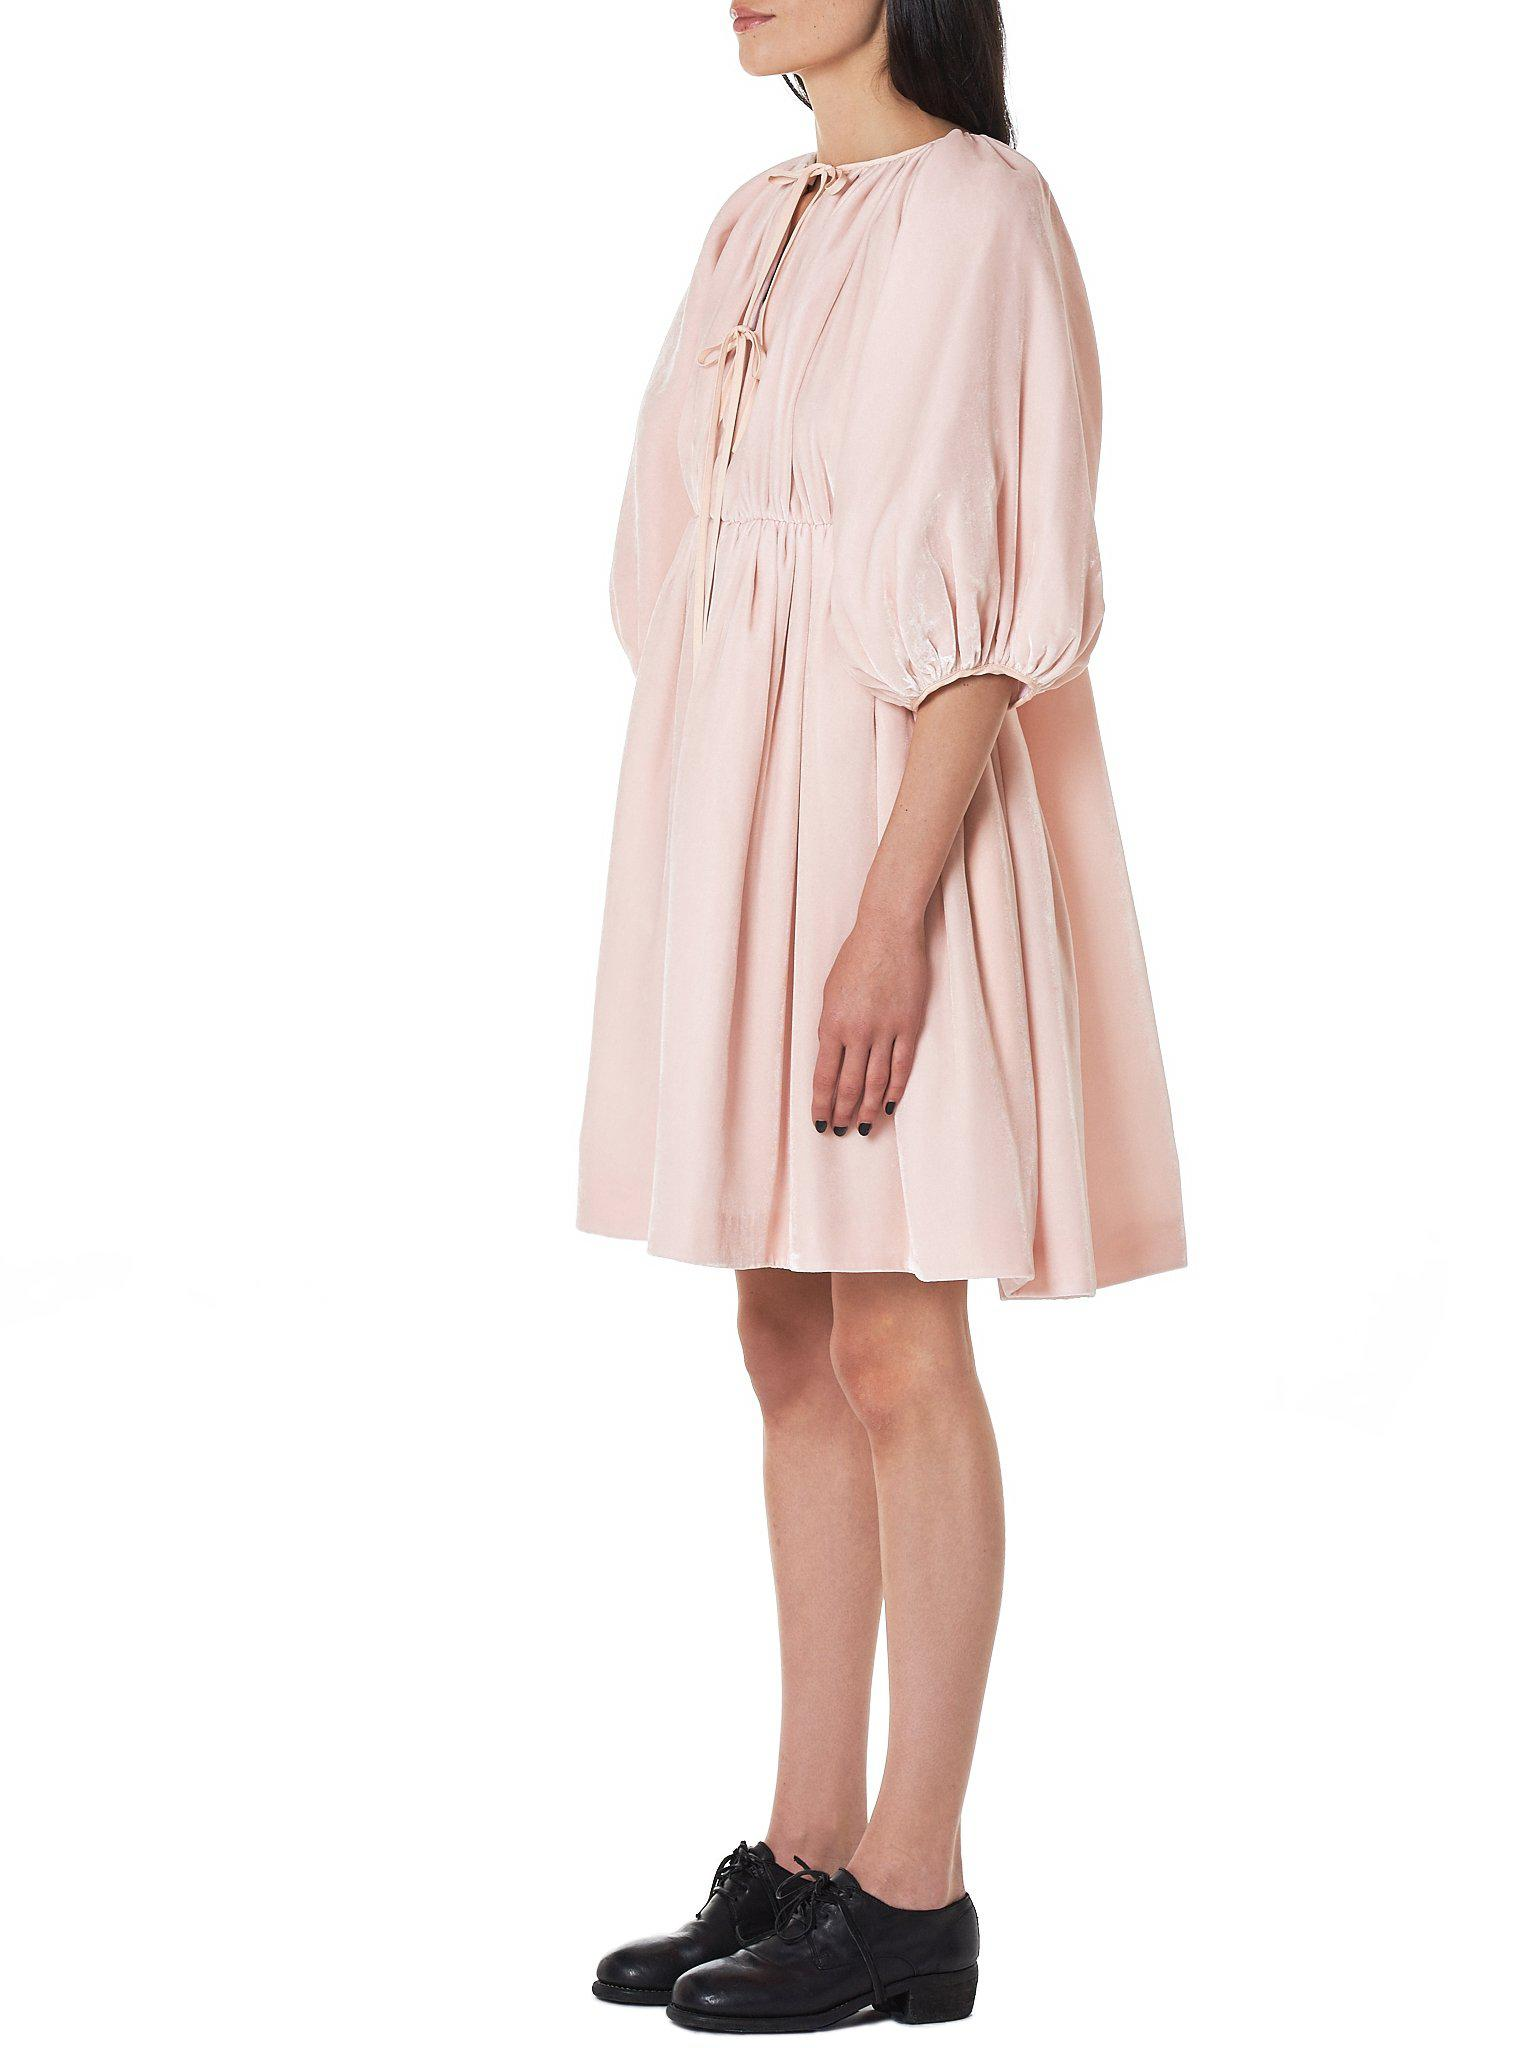 d8b484aaf279 Lyst - Cecile Bahnsen  ava  Puffed Sleeve Dress in Pink